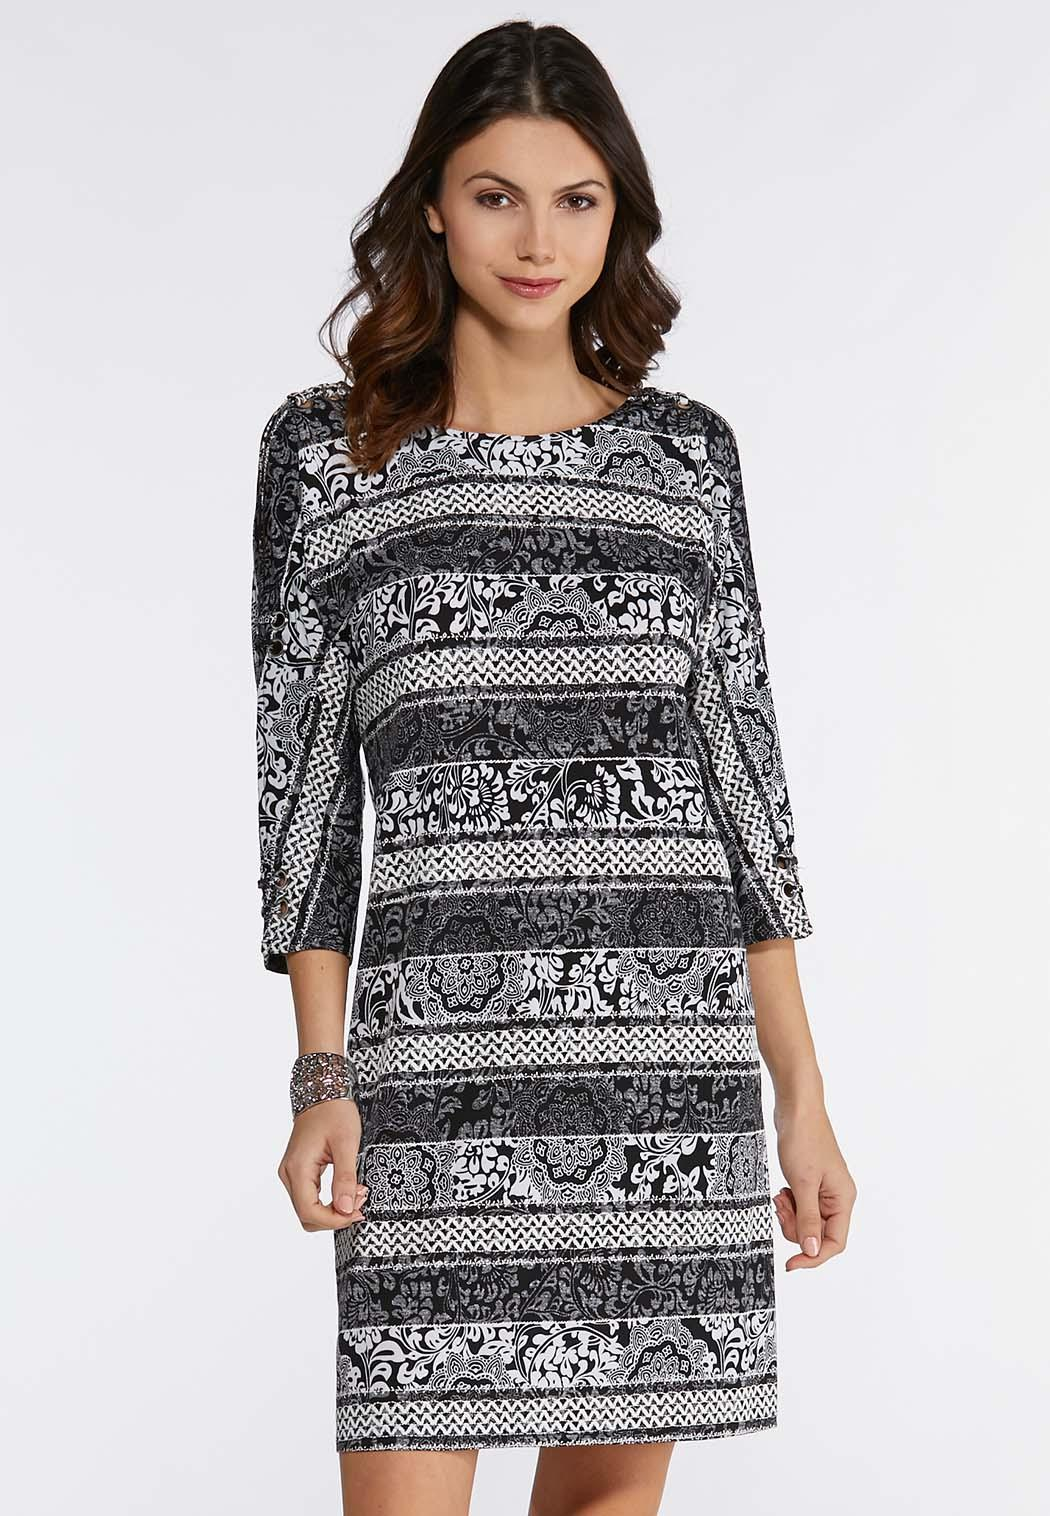 Plus Size Dresses For Women - Swing 270a4d7c42f3